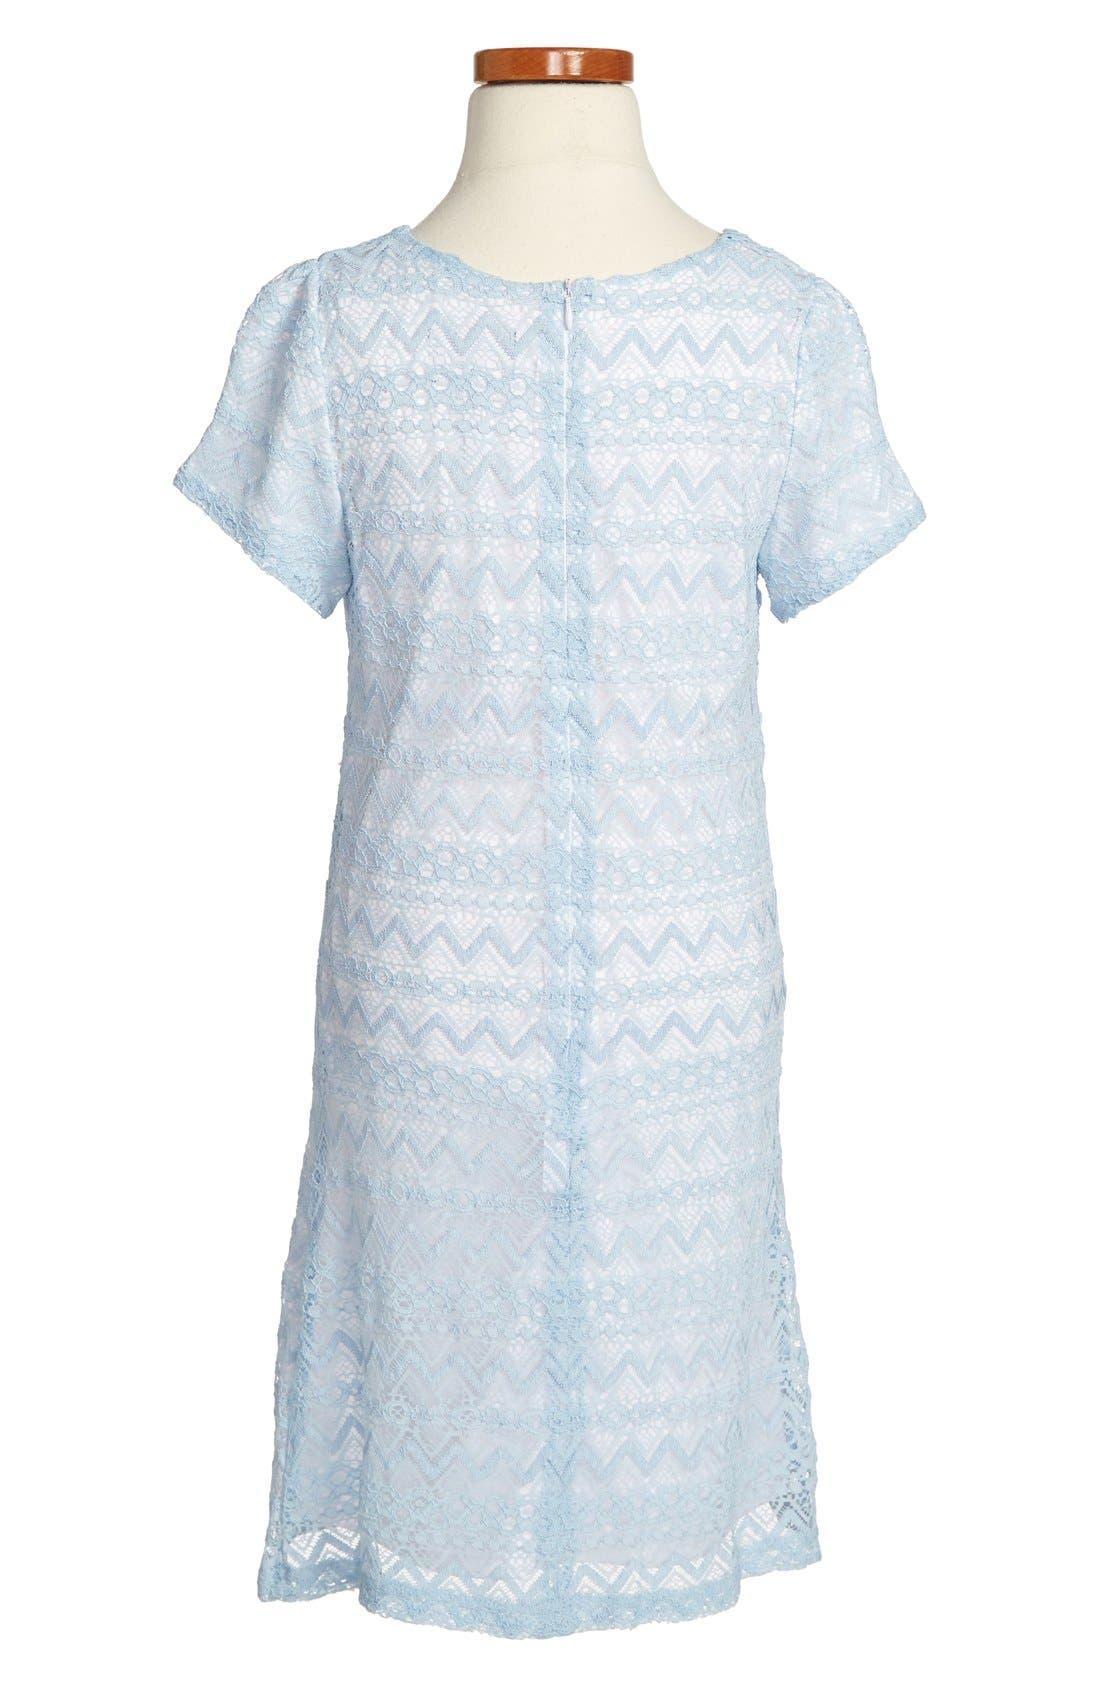 Alternate Image 2  - Laundry by Shelli Segal 'Lacey' Dress (Big Girls)